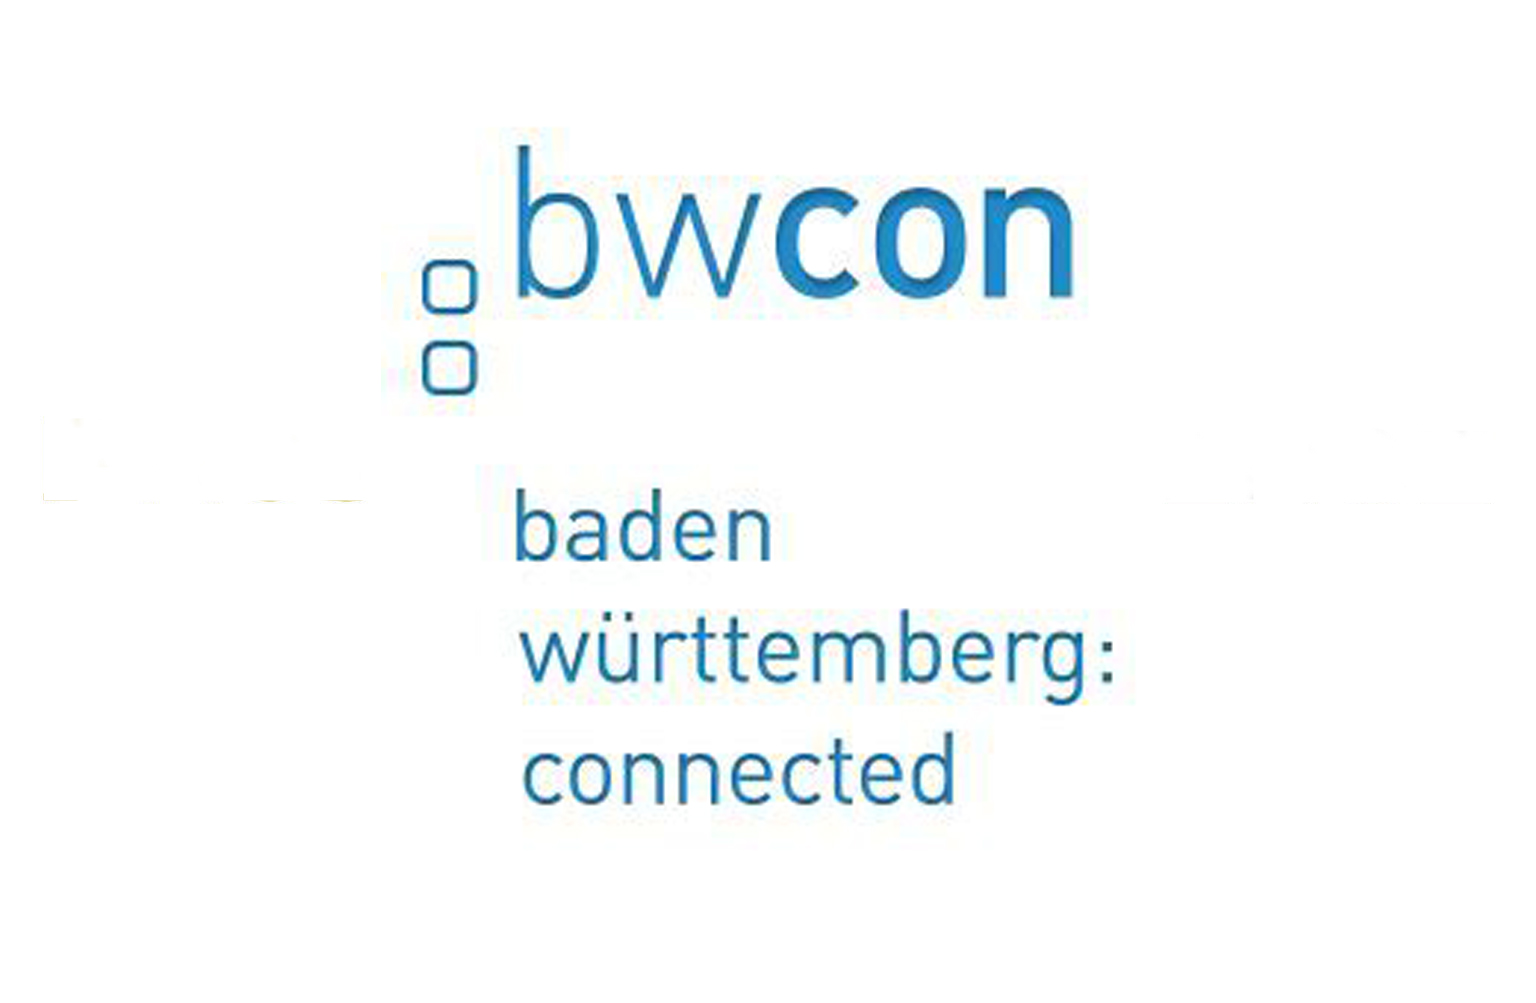 BWcon logo